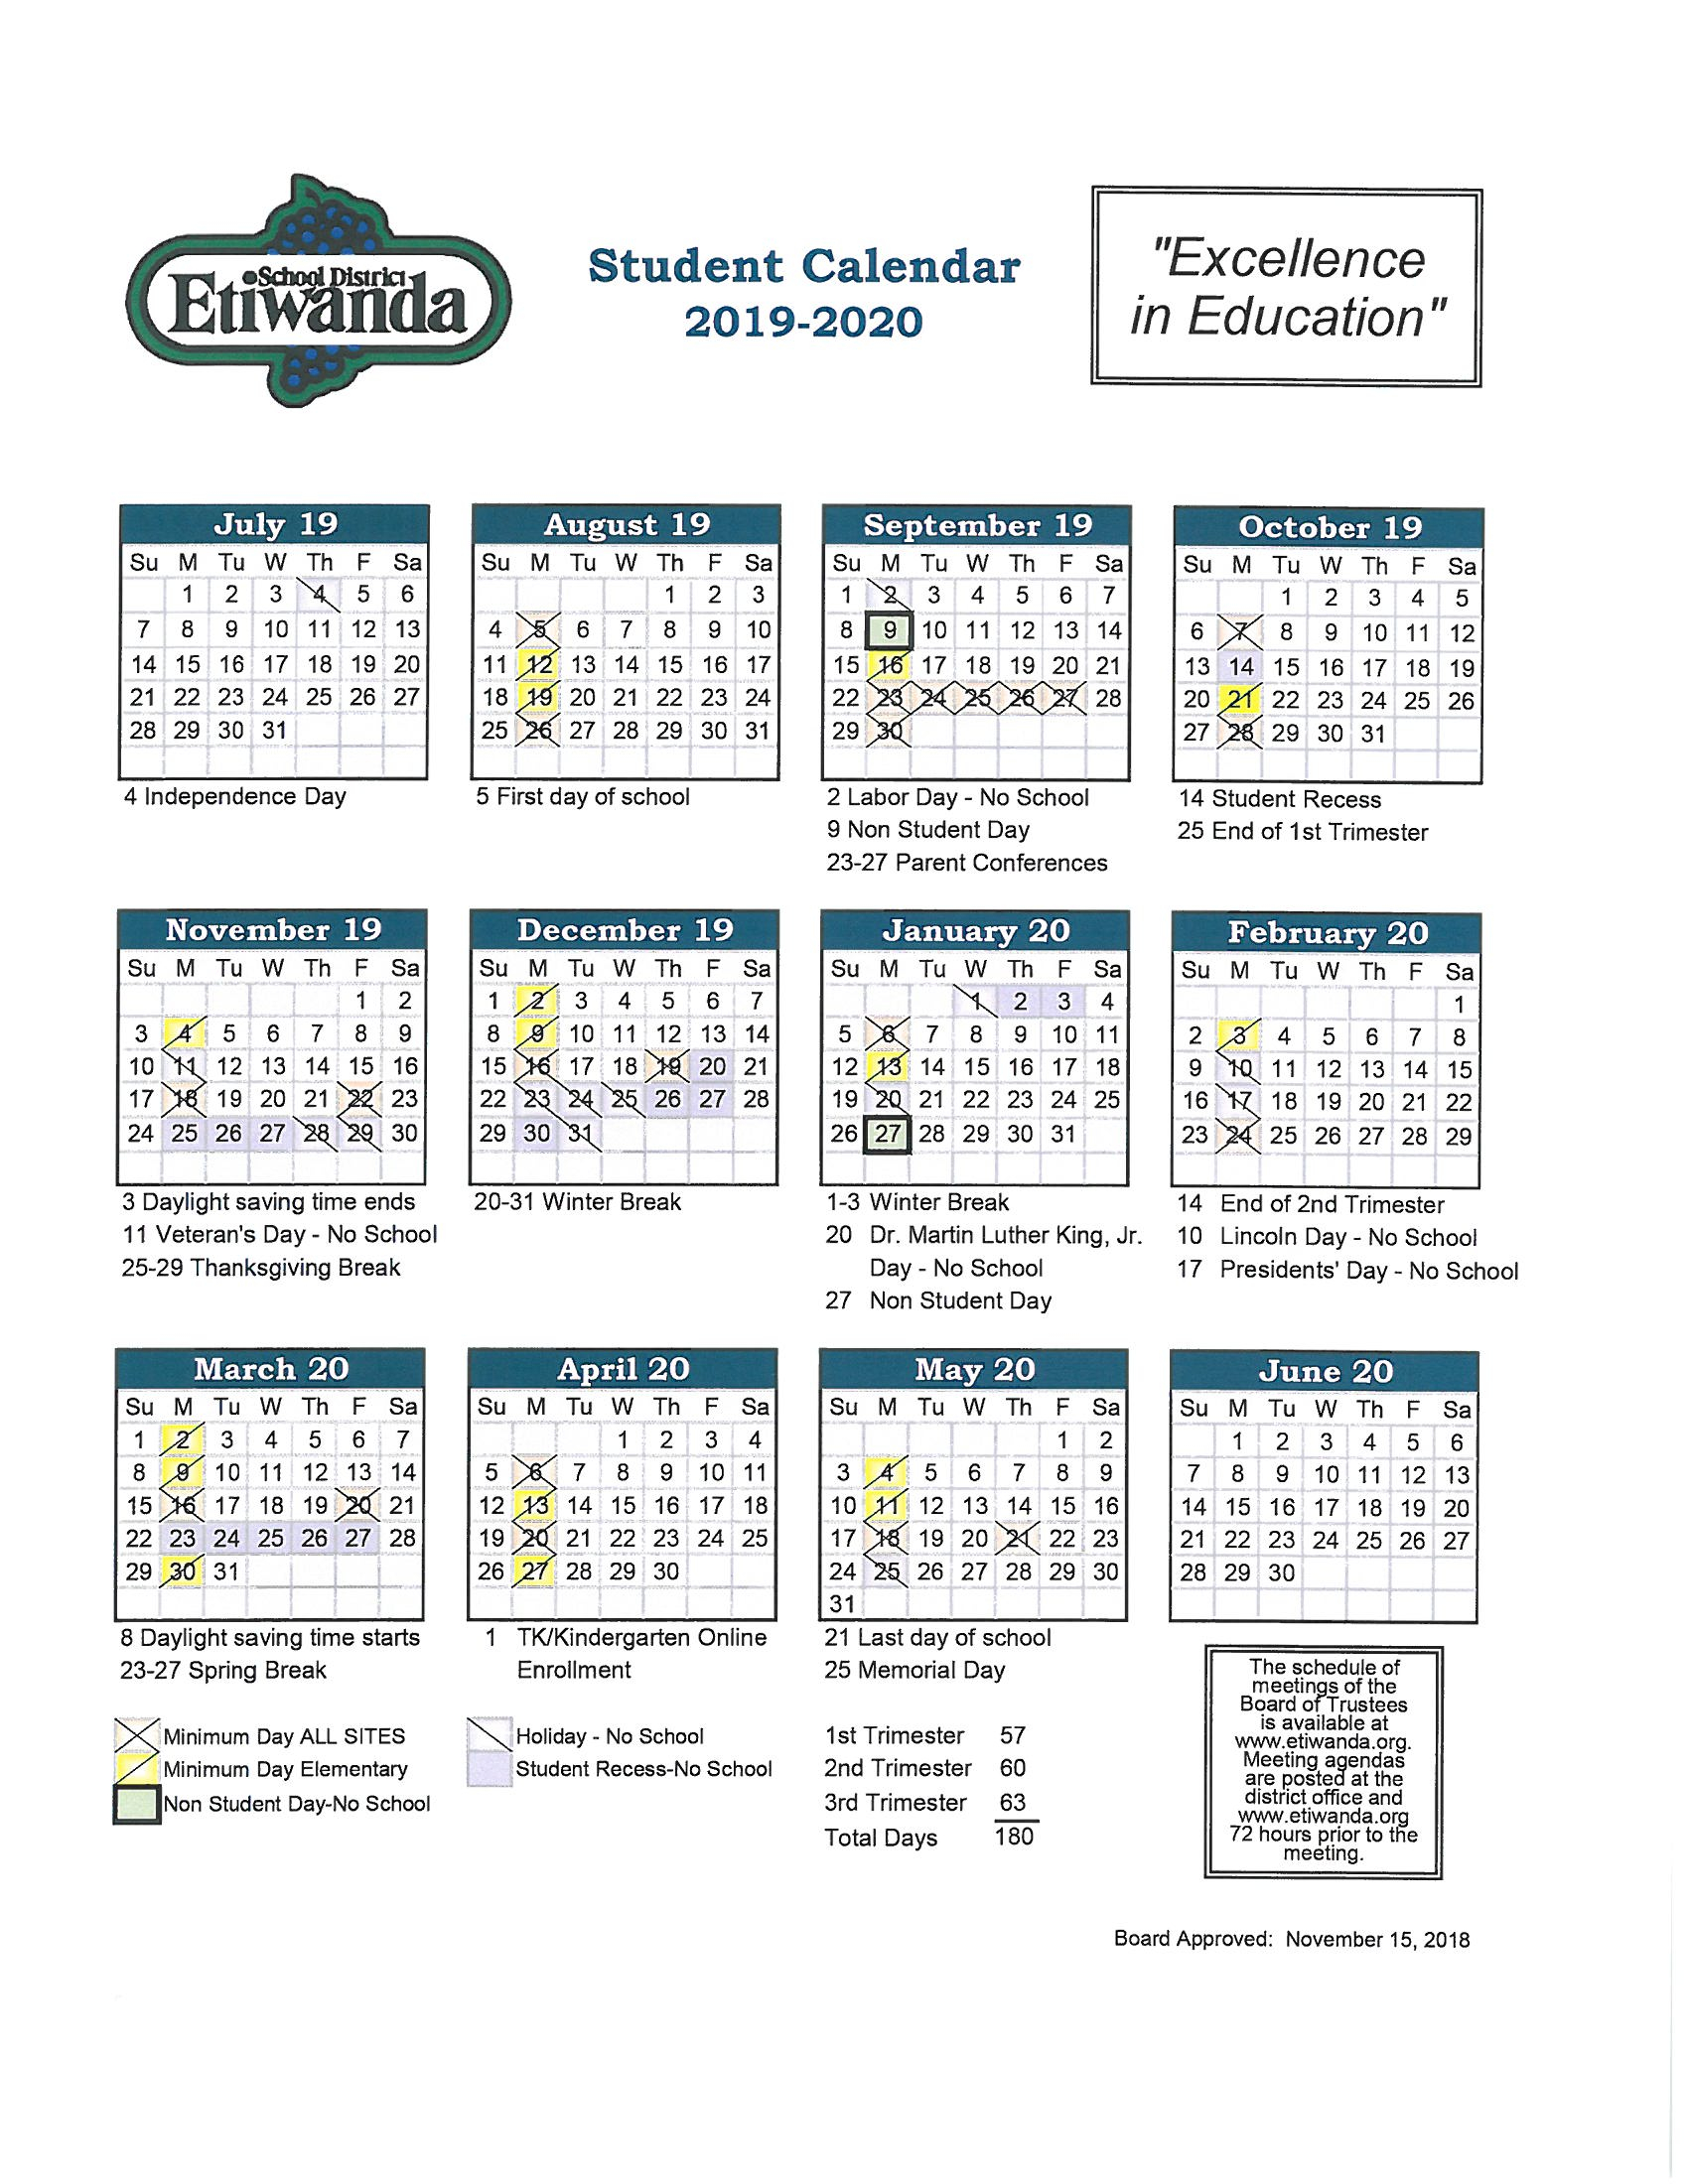 2019 2020 Student Calendar - Caryn Elementary With Regard To Fontana School District 12 Month Employee Calendar